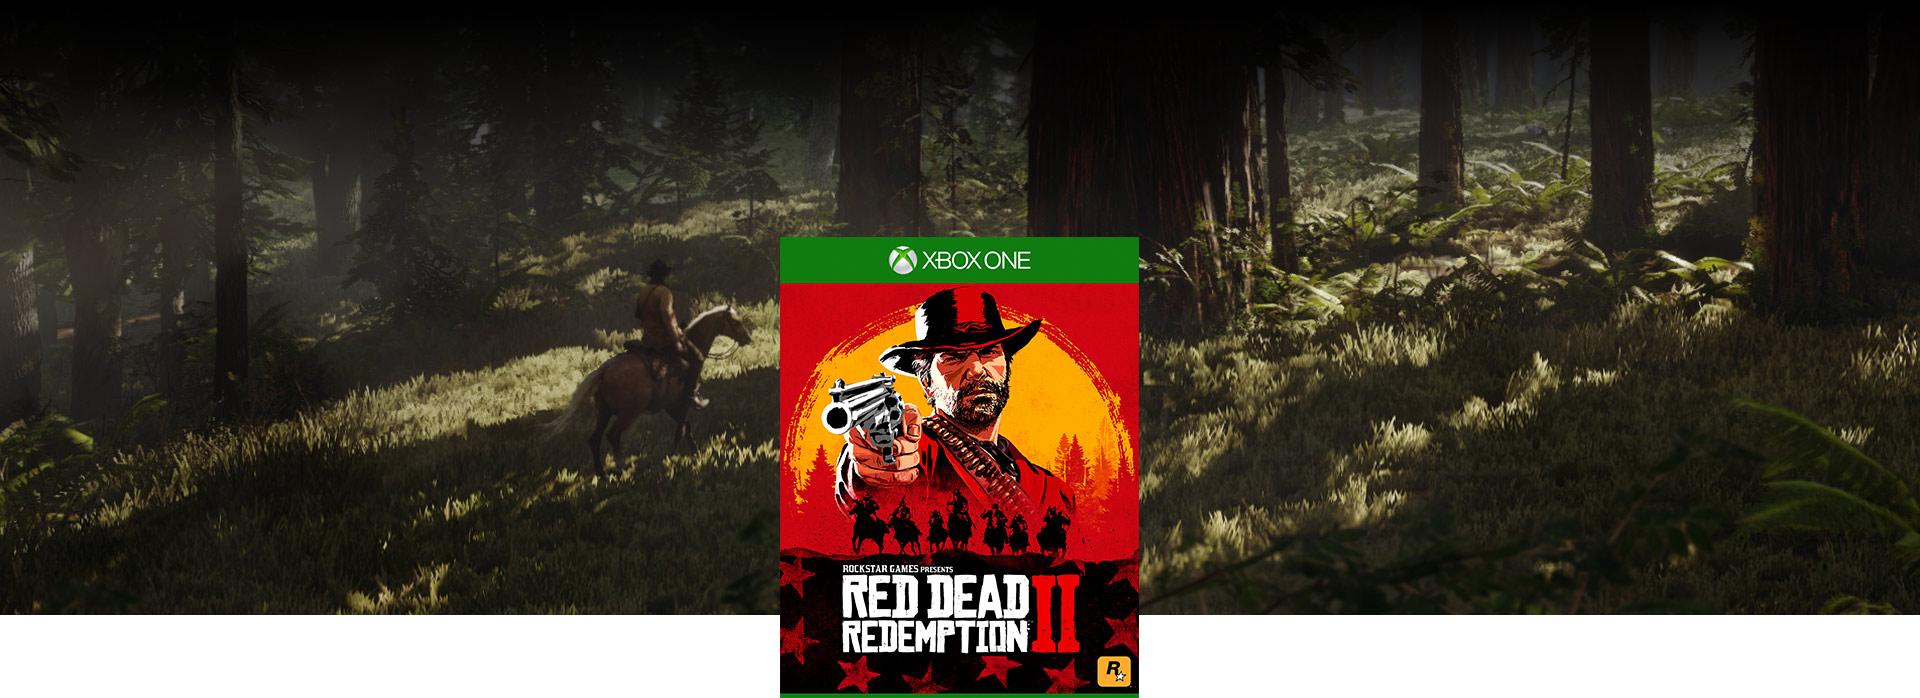 Boxshot του Red Dead Redemption 2 με χαρακτήρα που ιππεύει άλογο με δάσος στο φόντο